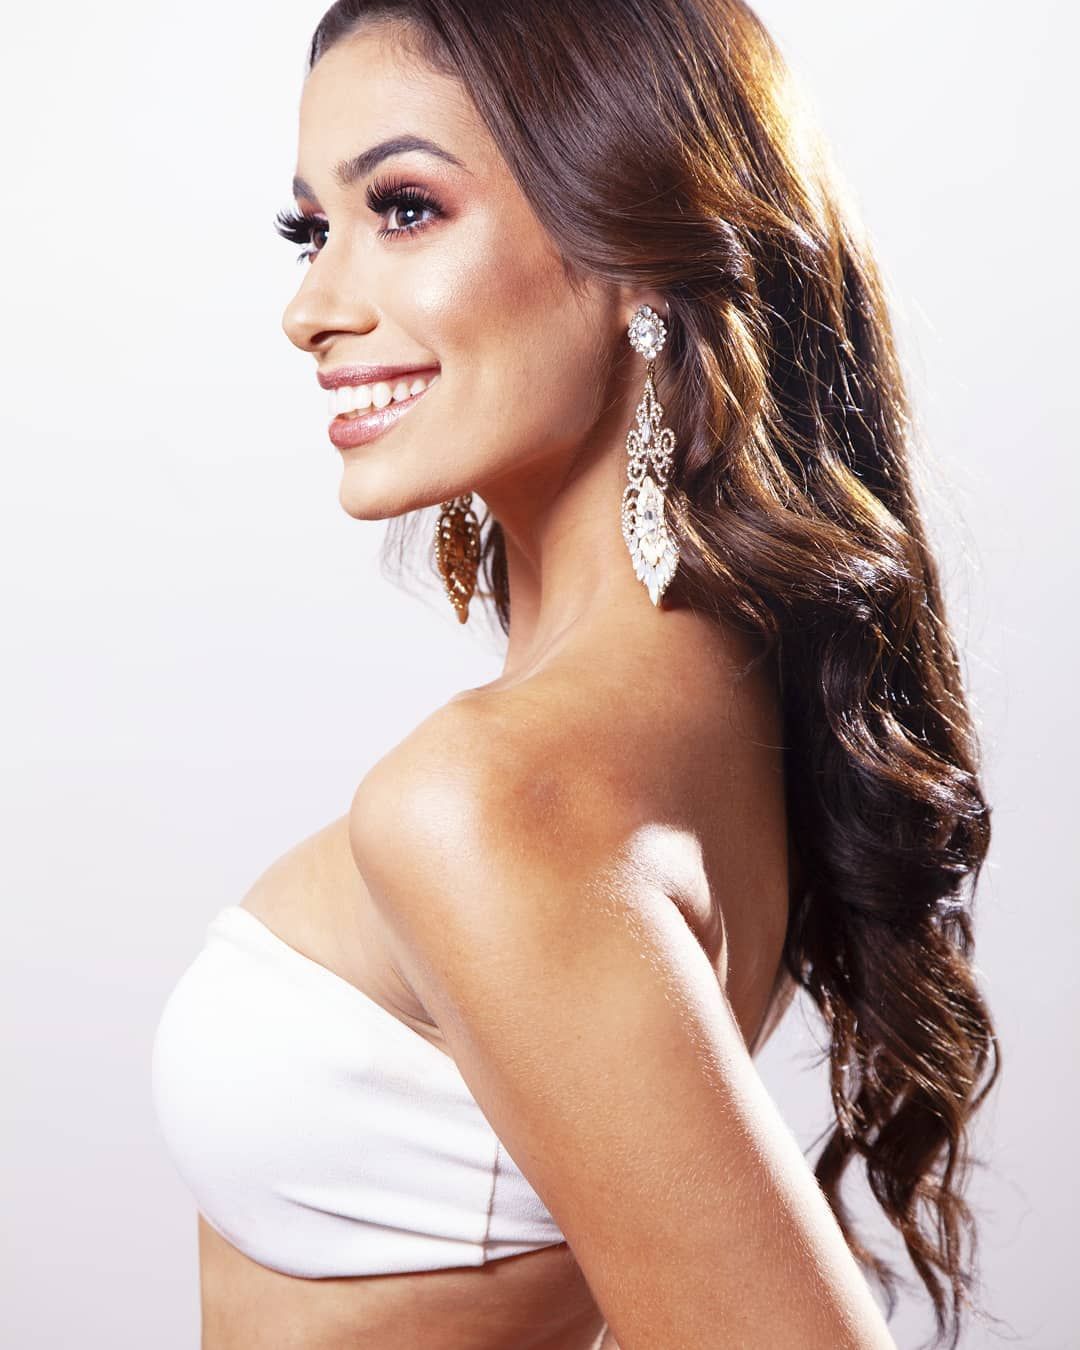 natalia gurgel, top model brasil 2021/miss morada nova 2019/miss sertao central empresarial 2018/top 20 de miss asia pacific international 2018, representando o uruguai. - Página 5 52034010